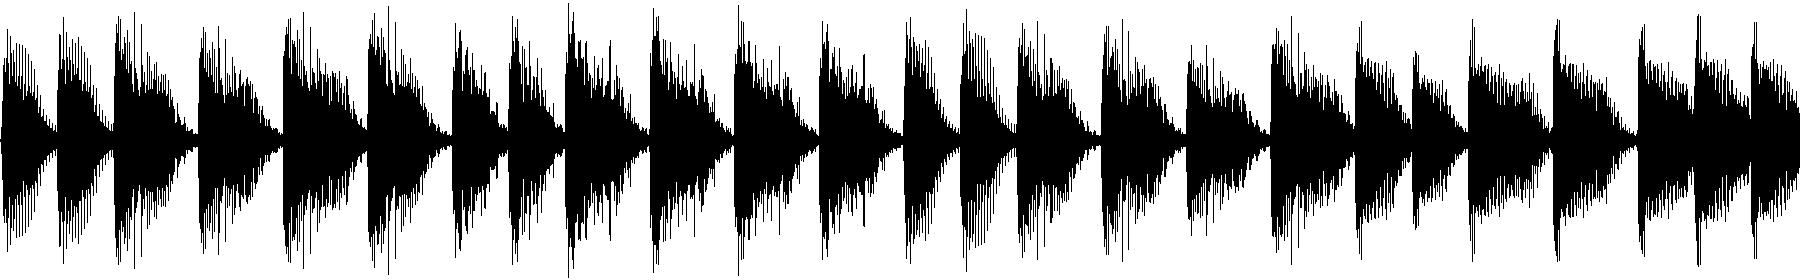 02 dh2 piano loop d 124